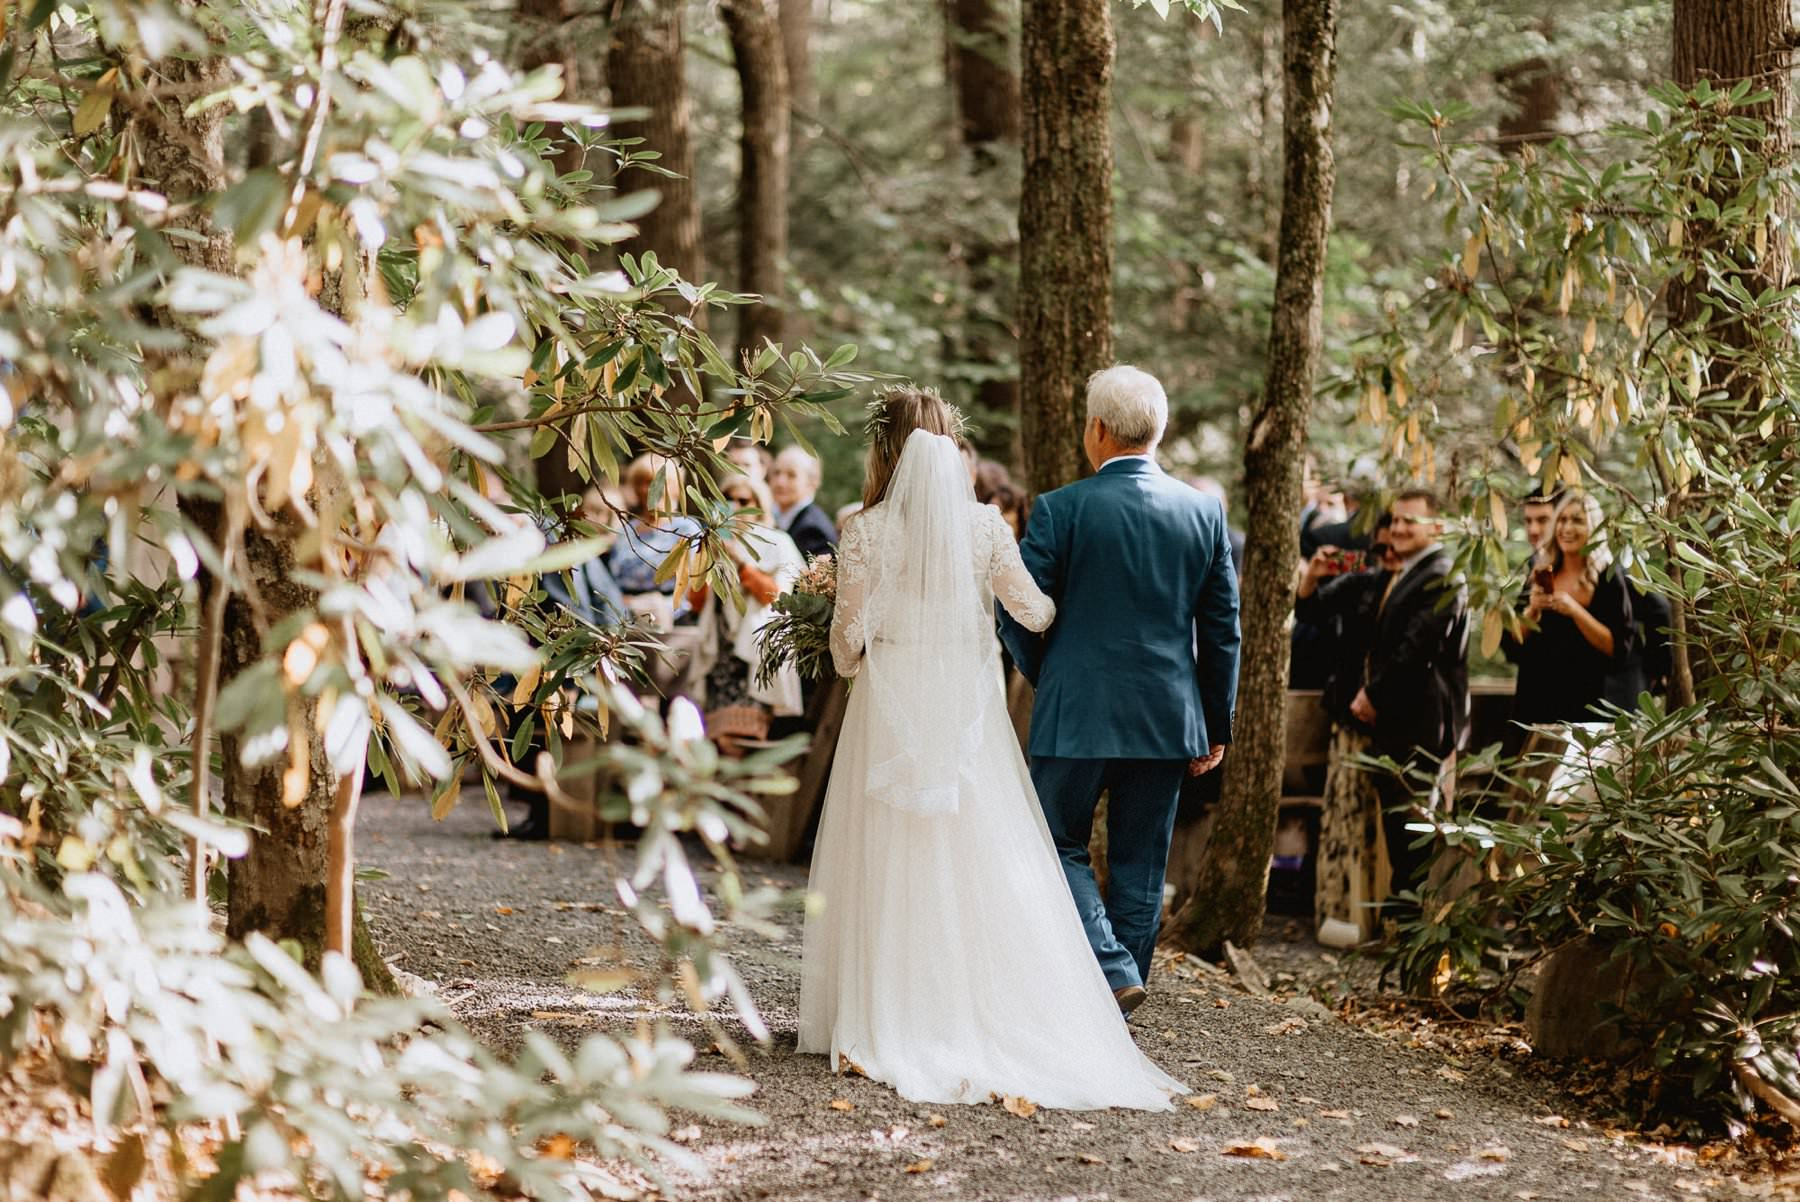 035-Tall-timber-barn-wedding-49.jpg